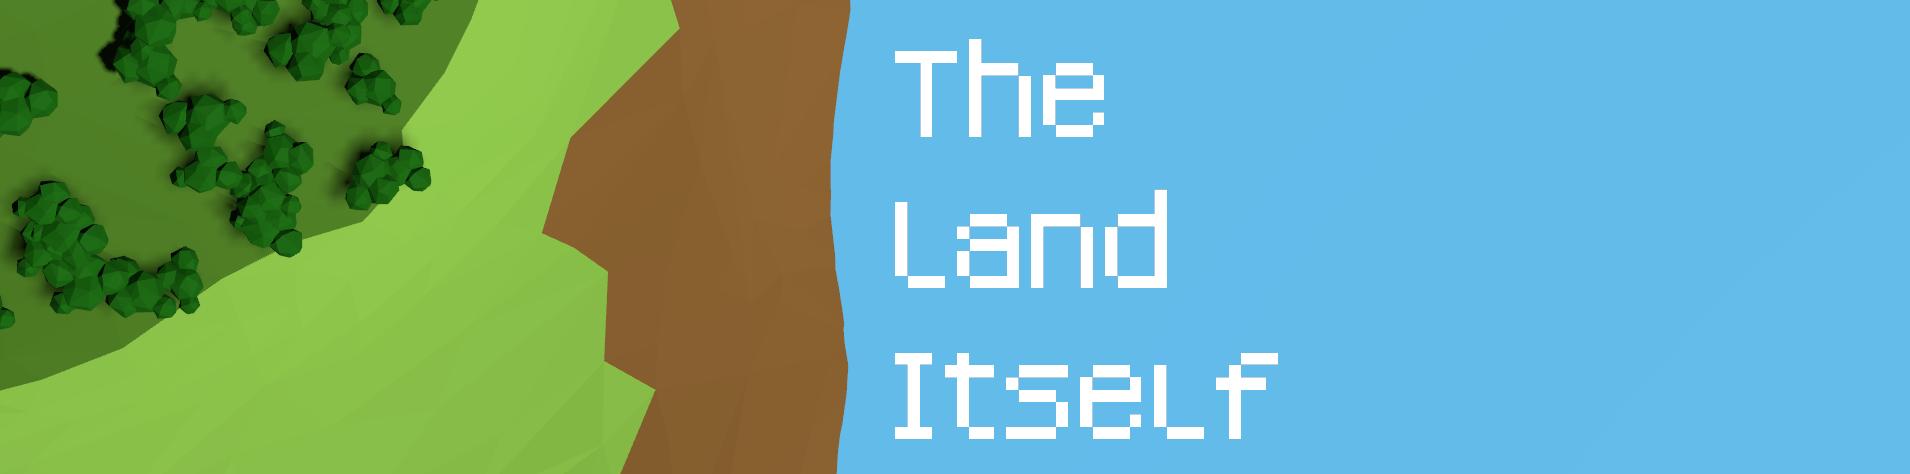 The Land Itself